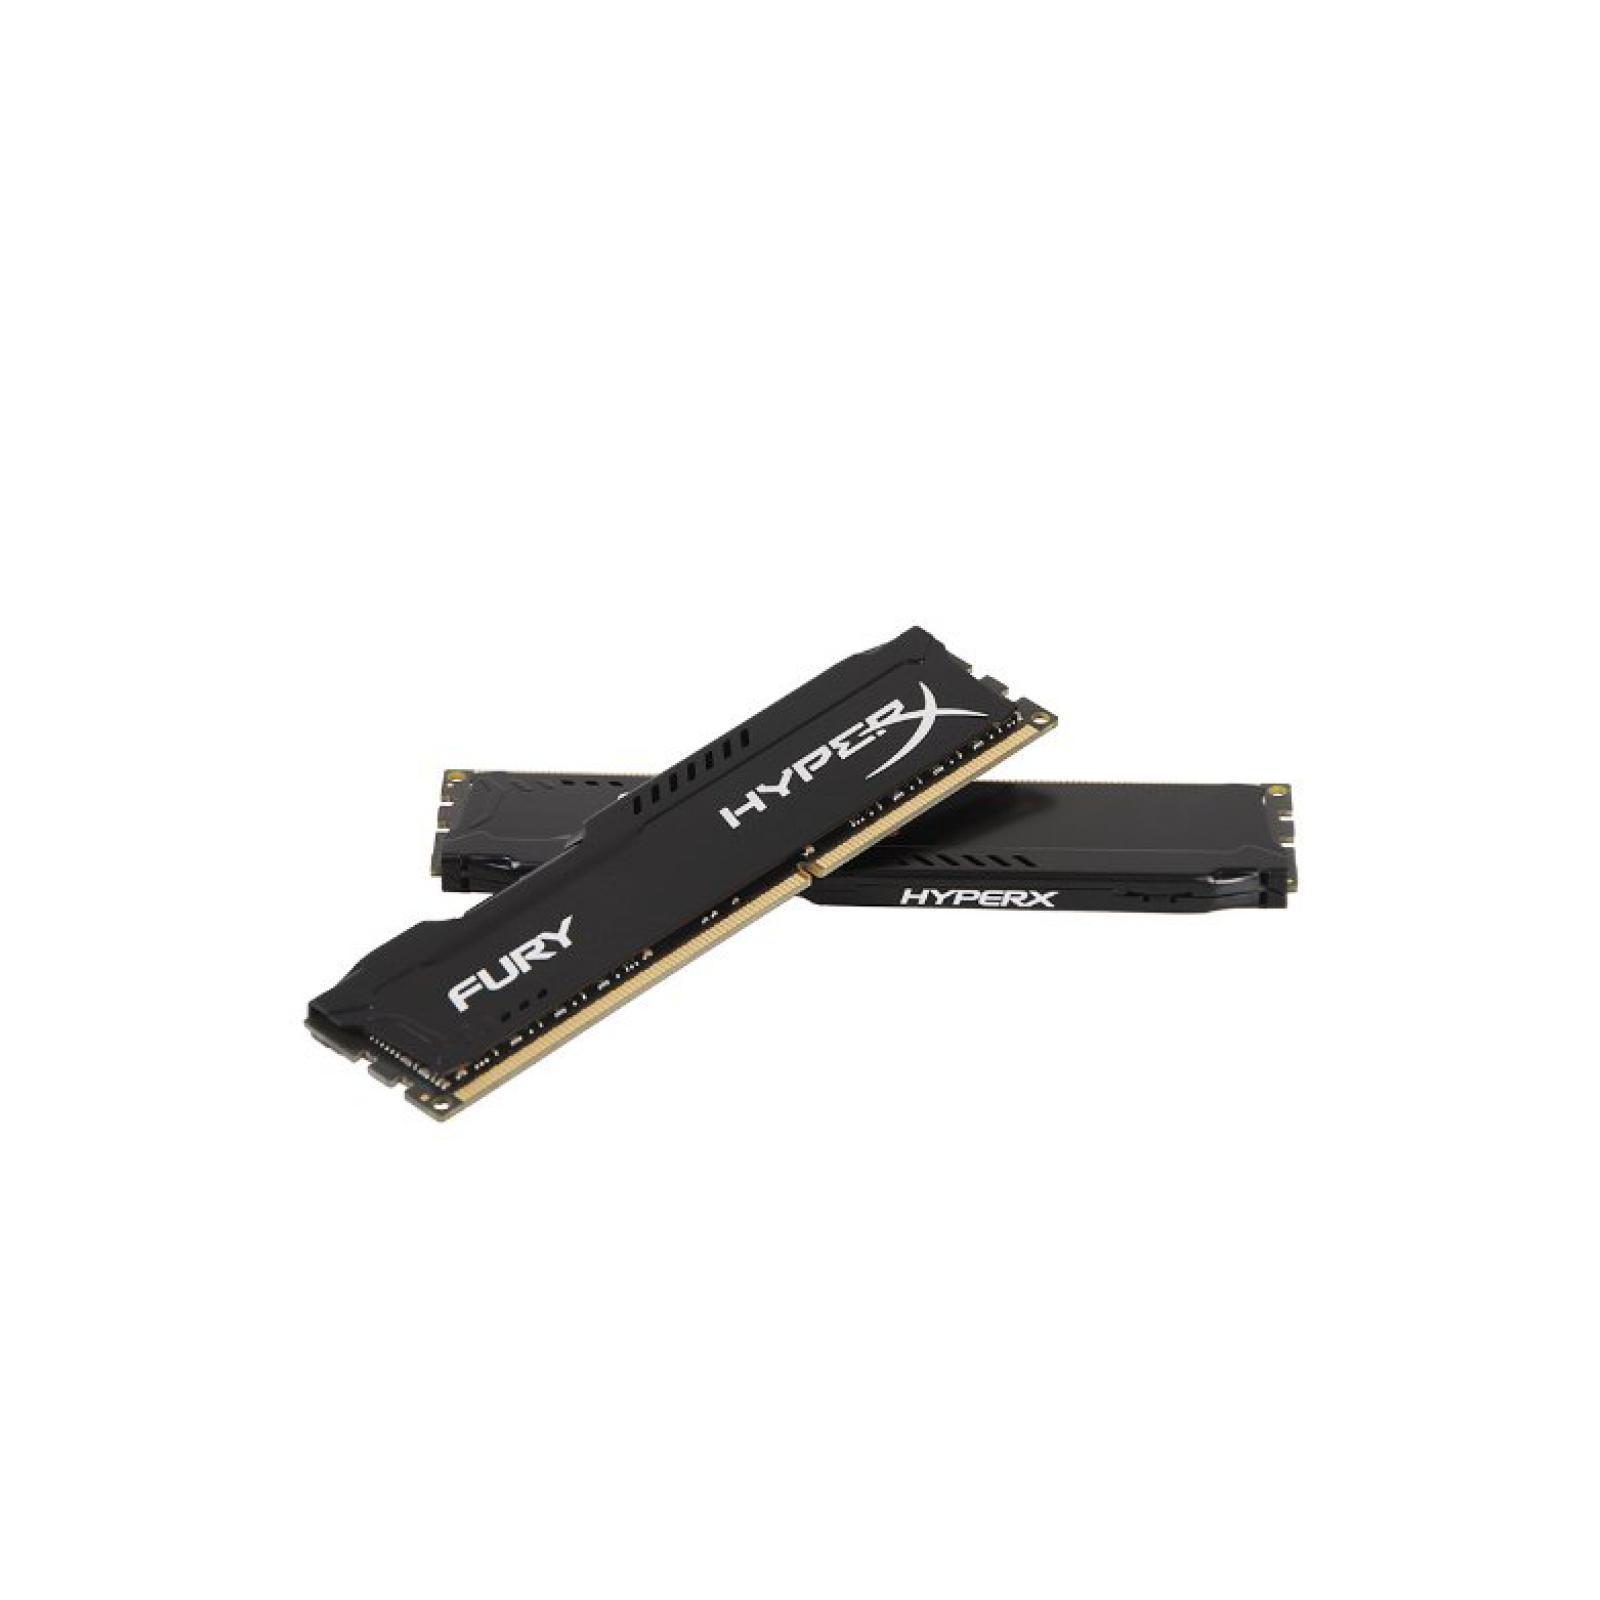 Модуль памяти для компьютера DDR4 32GB (2x16GB) 3200 MHz HyperX FURY Black HyperX (Kingston Fury) (HX432C18FBK2/32) изображение 4